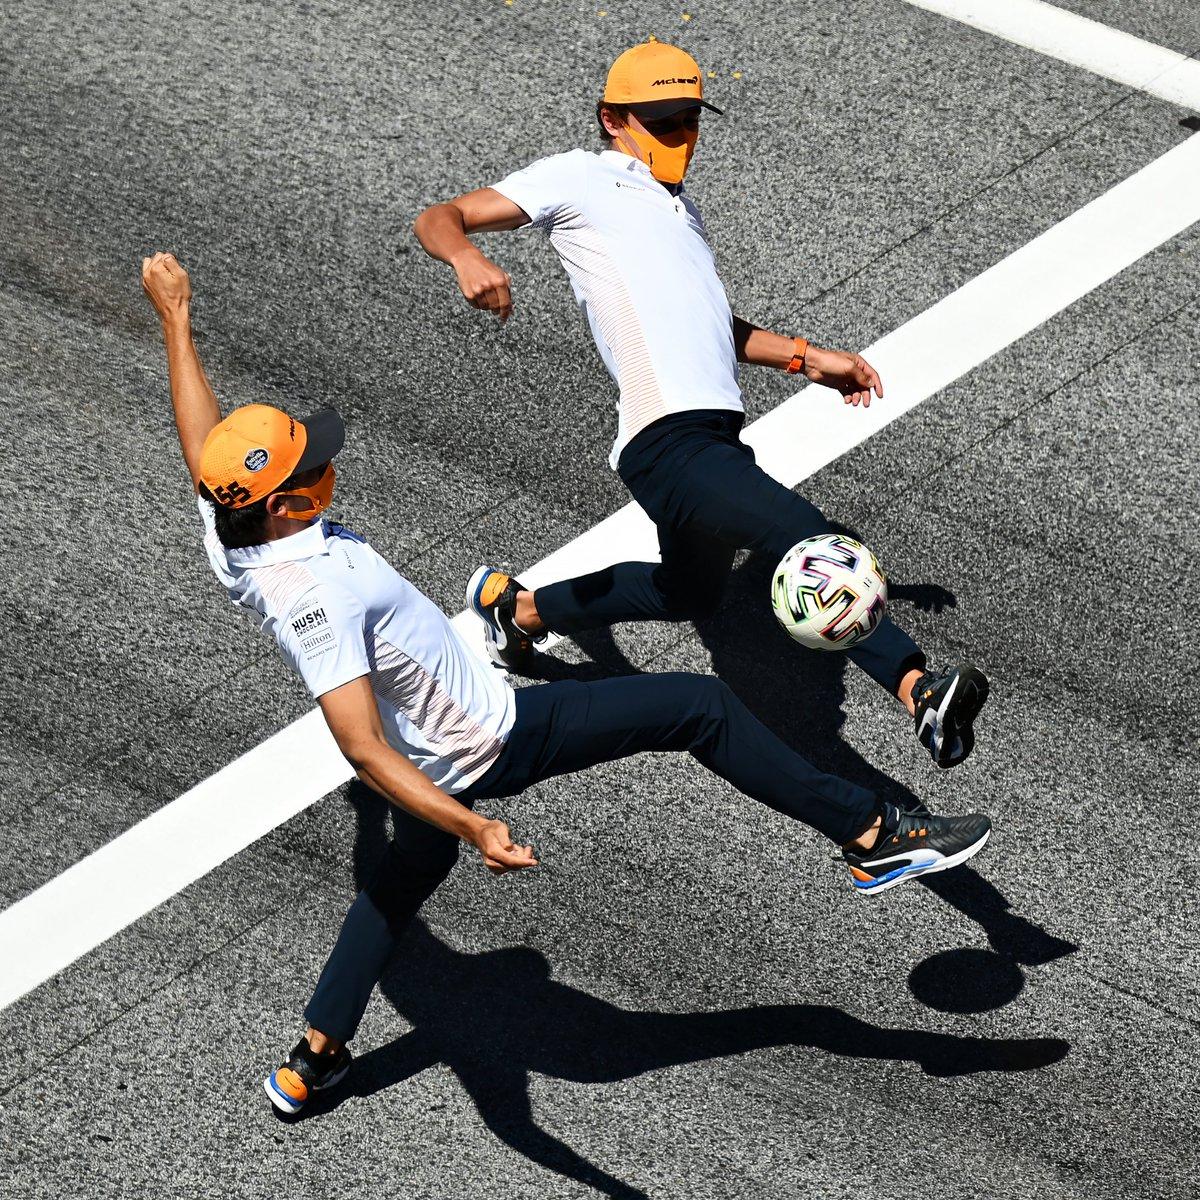 🔶 @McLarenF1 🆚 @ScuderiaFerrari 🔴  Who would win? ⚽️  #F1 https://t.co/OHhv7Zd33r